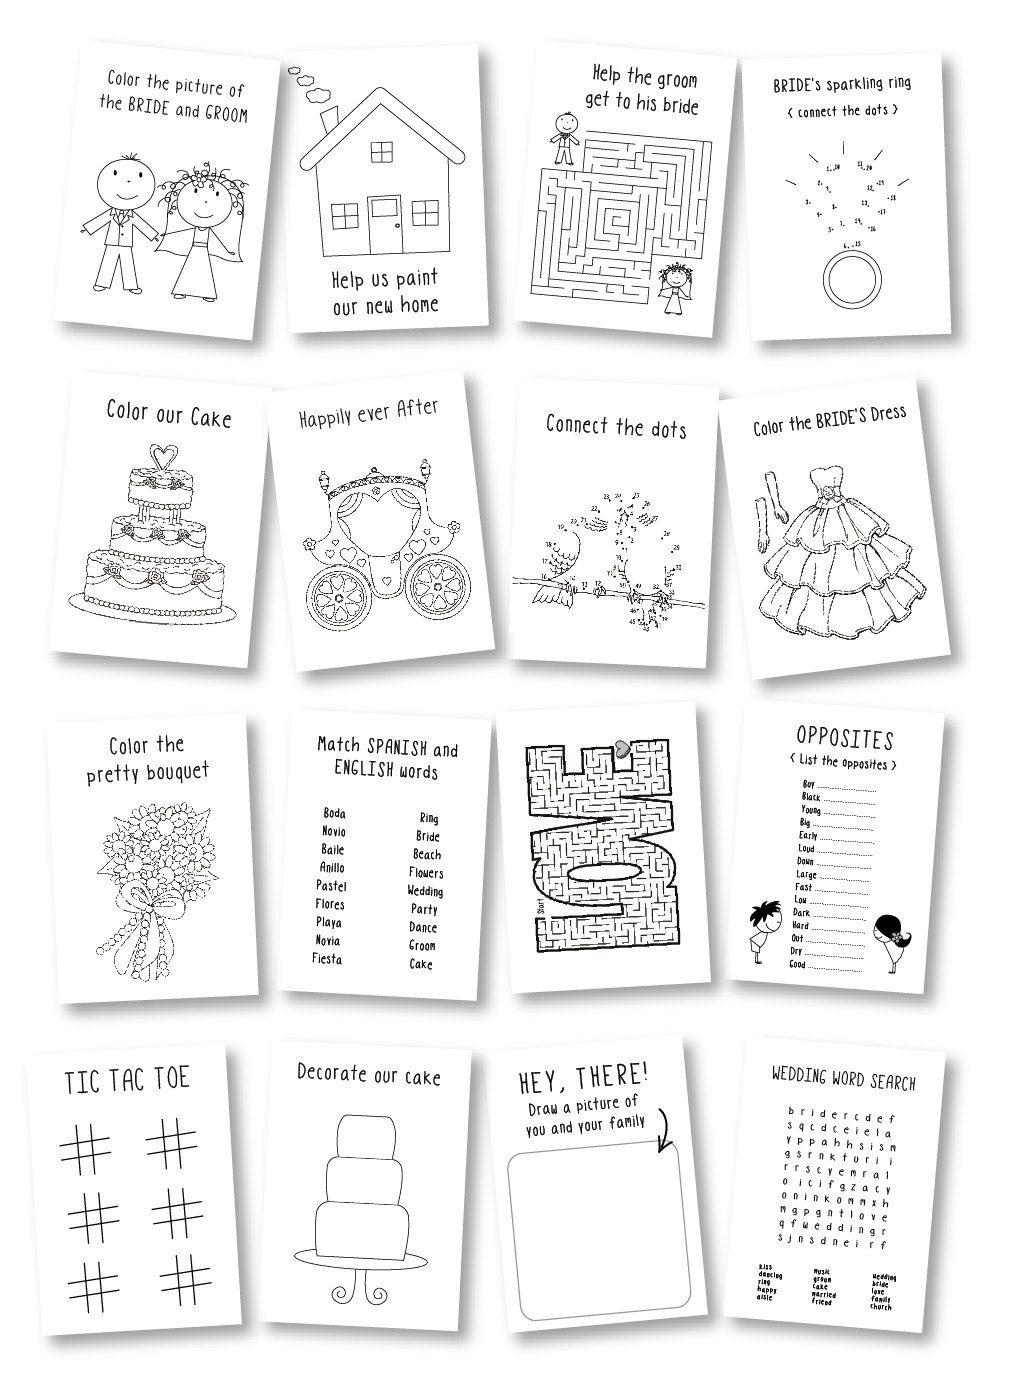 coloring book wedding : Kids Wedding Coloring Book Wedding Favor Kids Wedding Activity Book Rustic Wedding Activity Book With Crayons Set Of 6